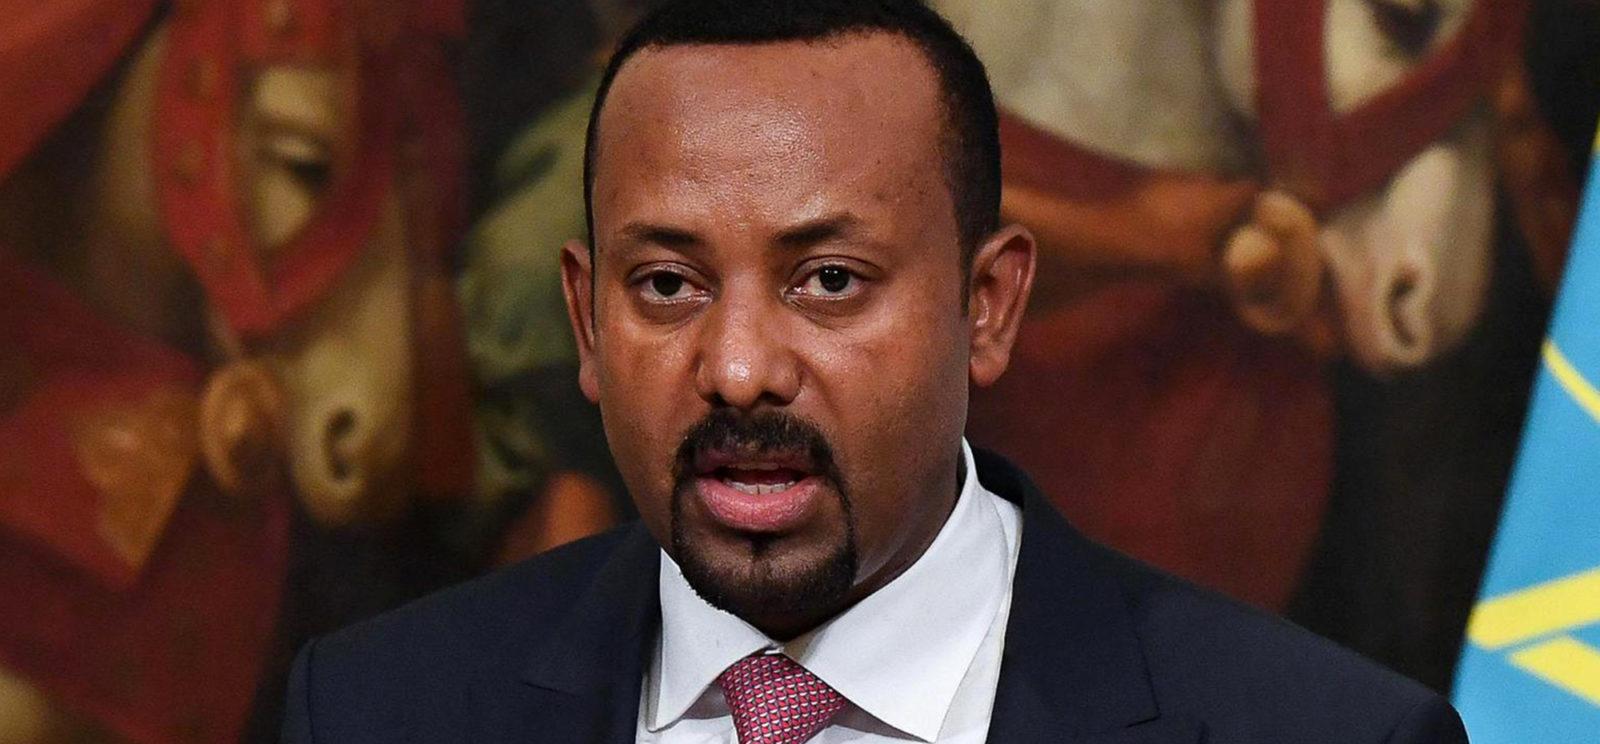 Ethiopian Prime Minister Abiy Ahmed Ali, the 2019 Nobel Peace Prize laureate. (Photo: EPA-EFE / Alessandro de Meo)